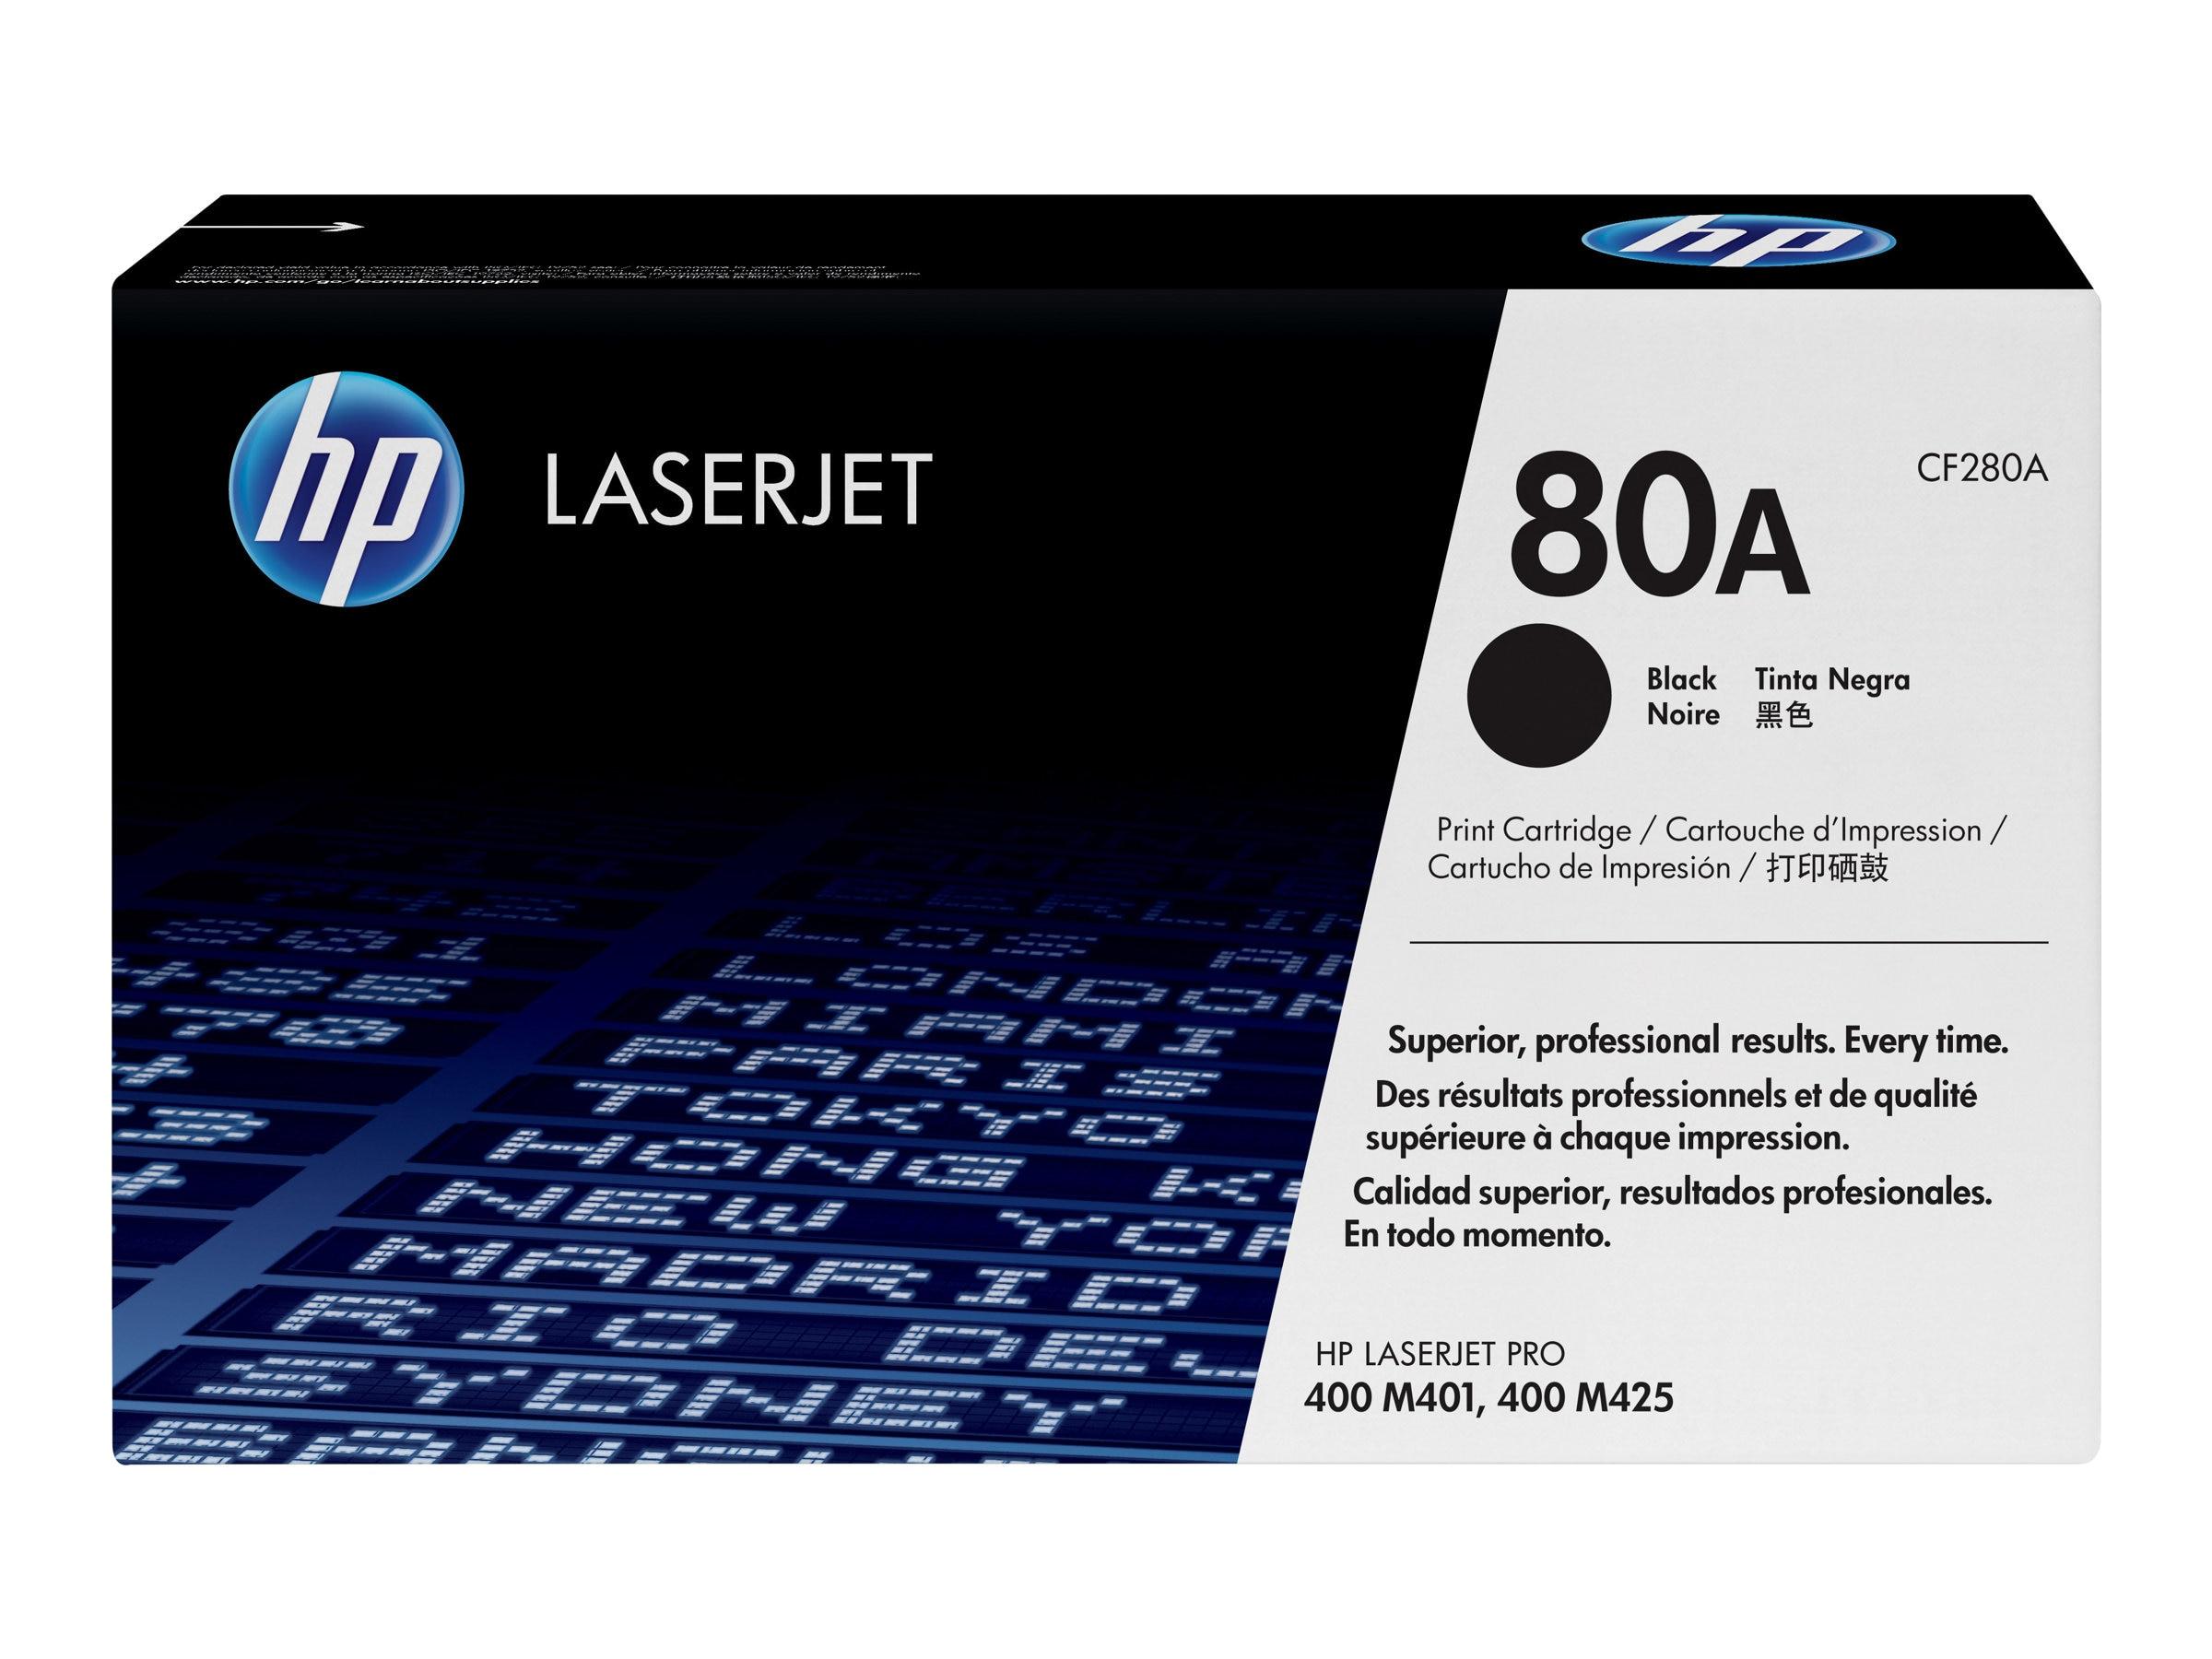 HP Inc. CF280A Image 1